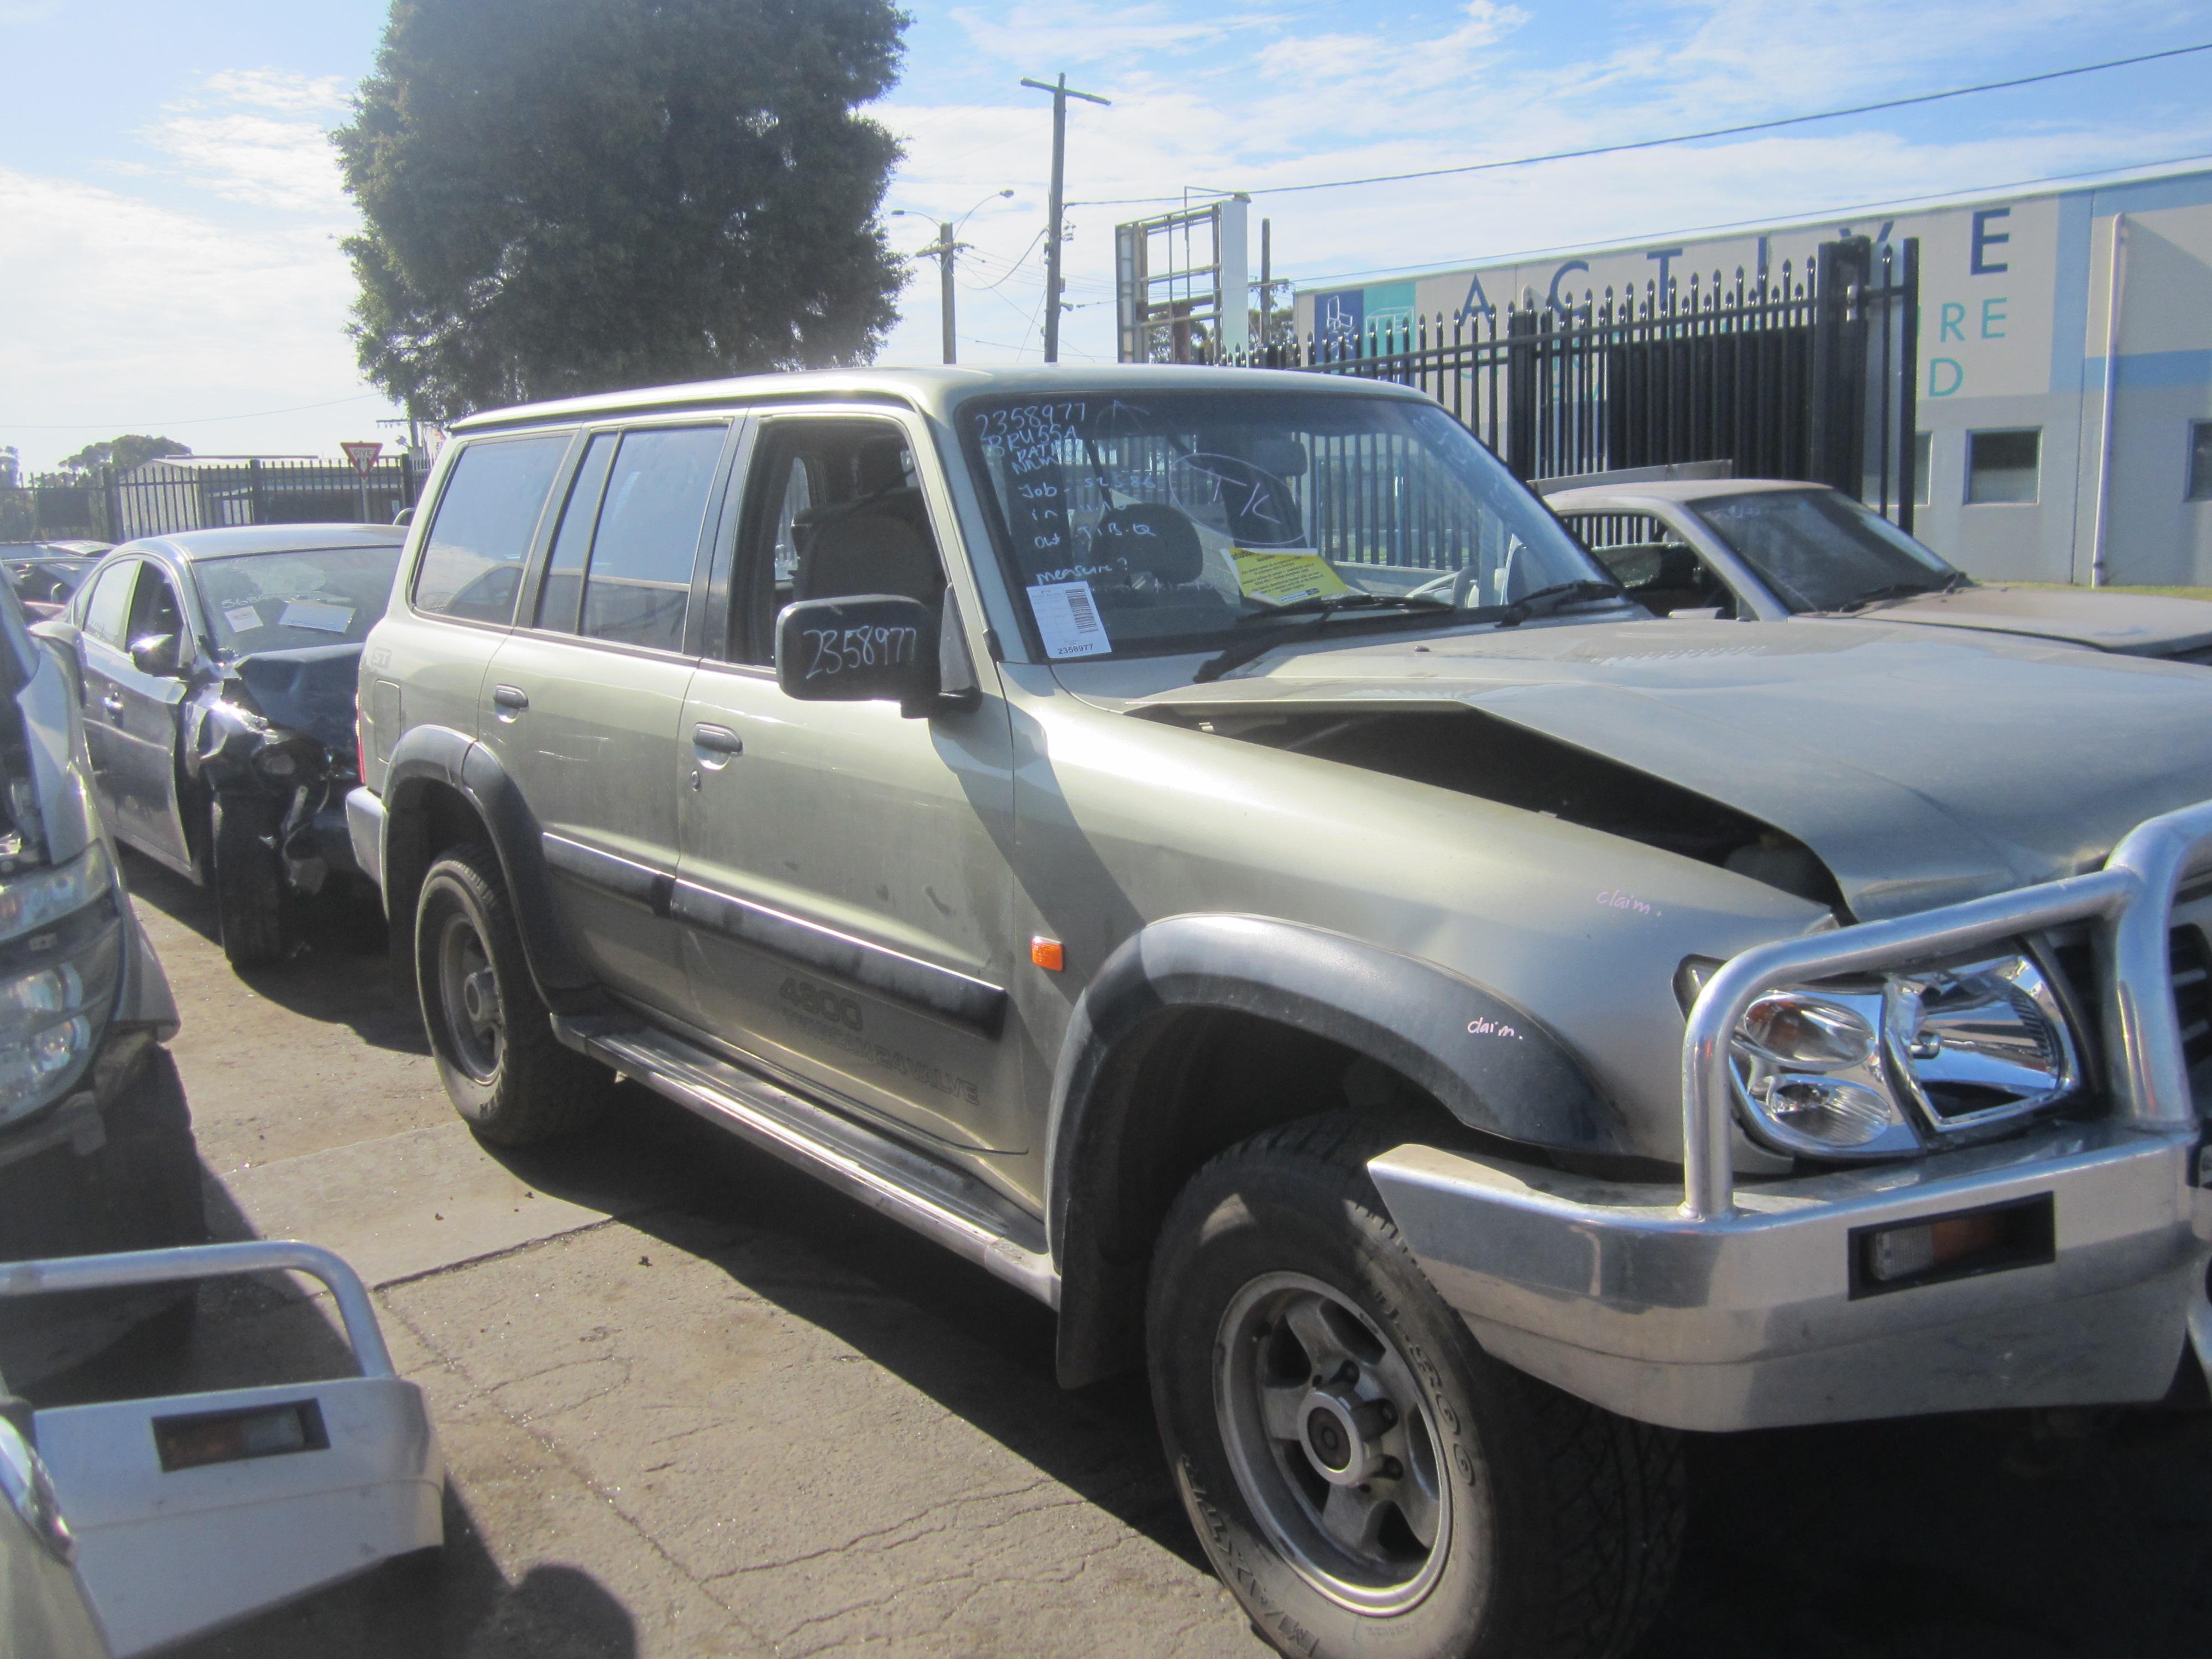 nissan patrol y61 gu tb48 petrol auto 2003 wrecking. Black Bedroom Furniture Sets. Home Design Ideas